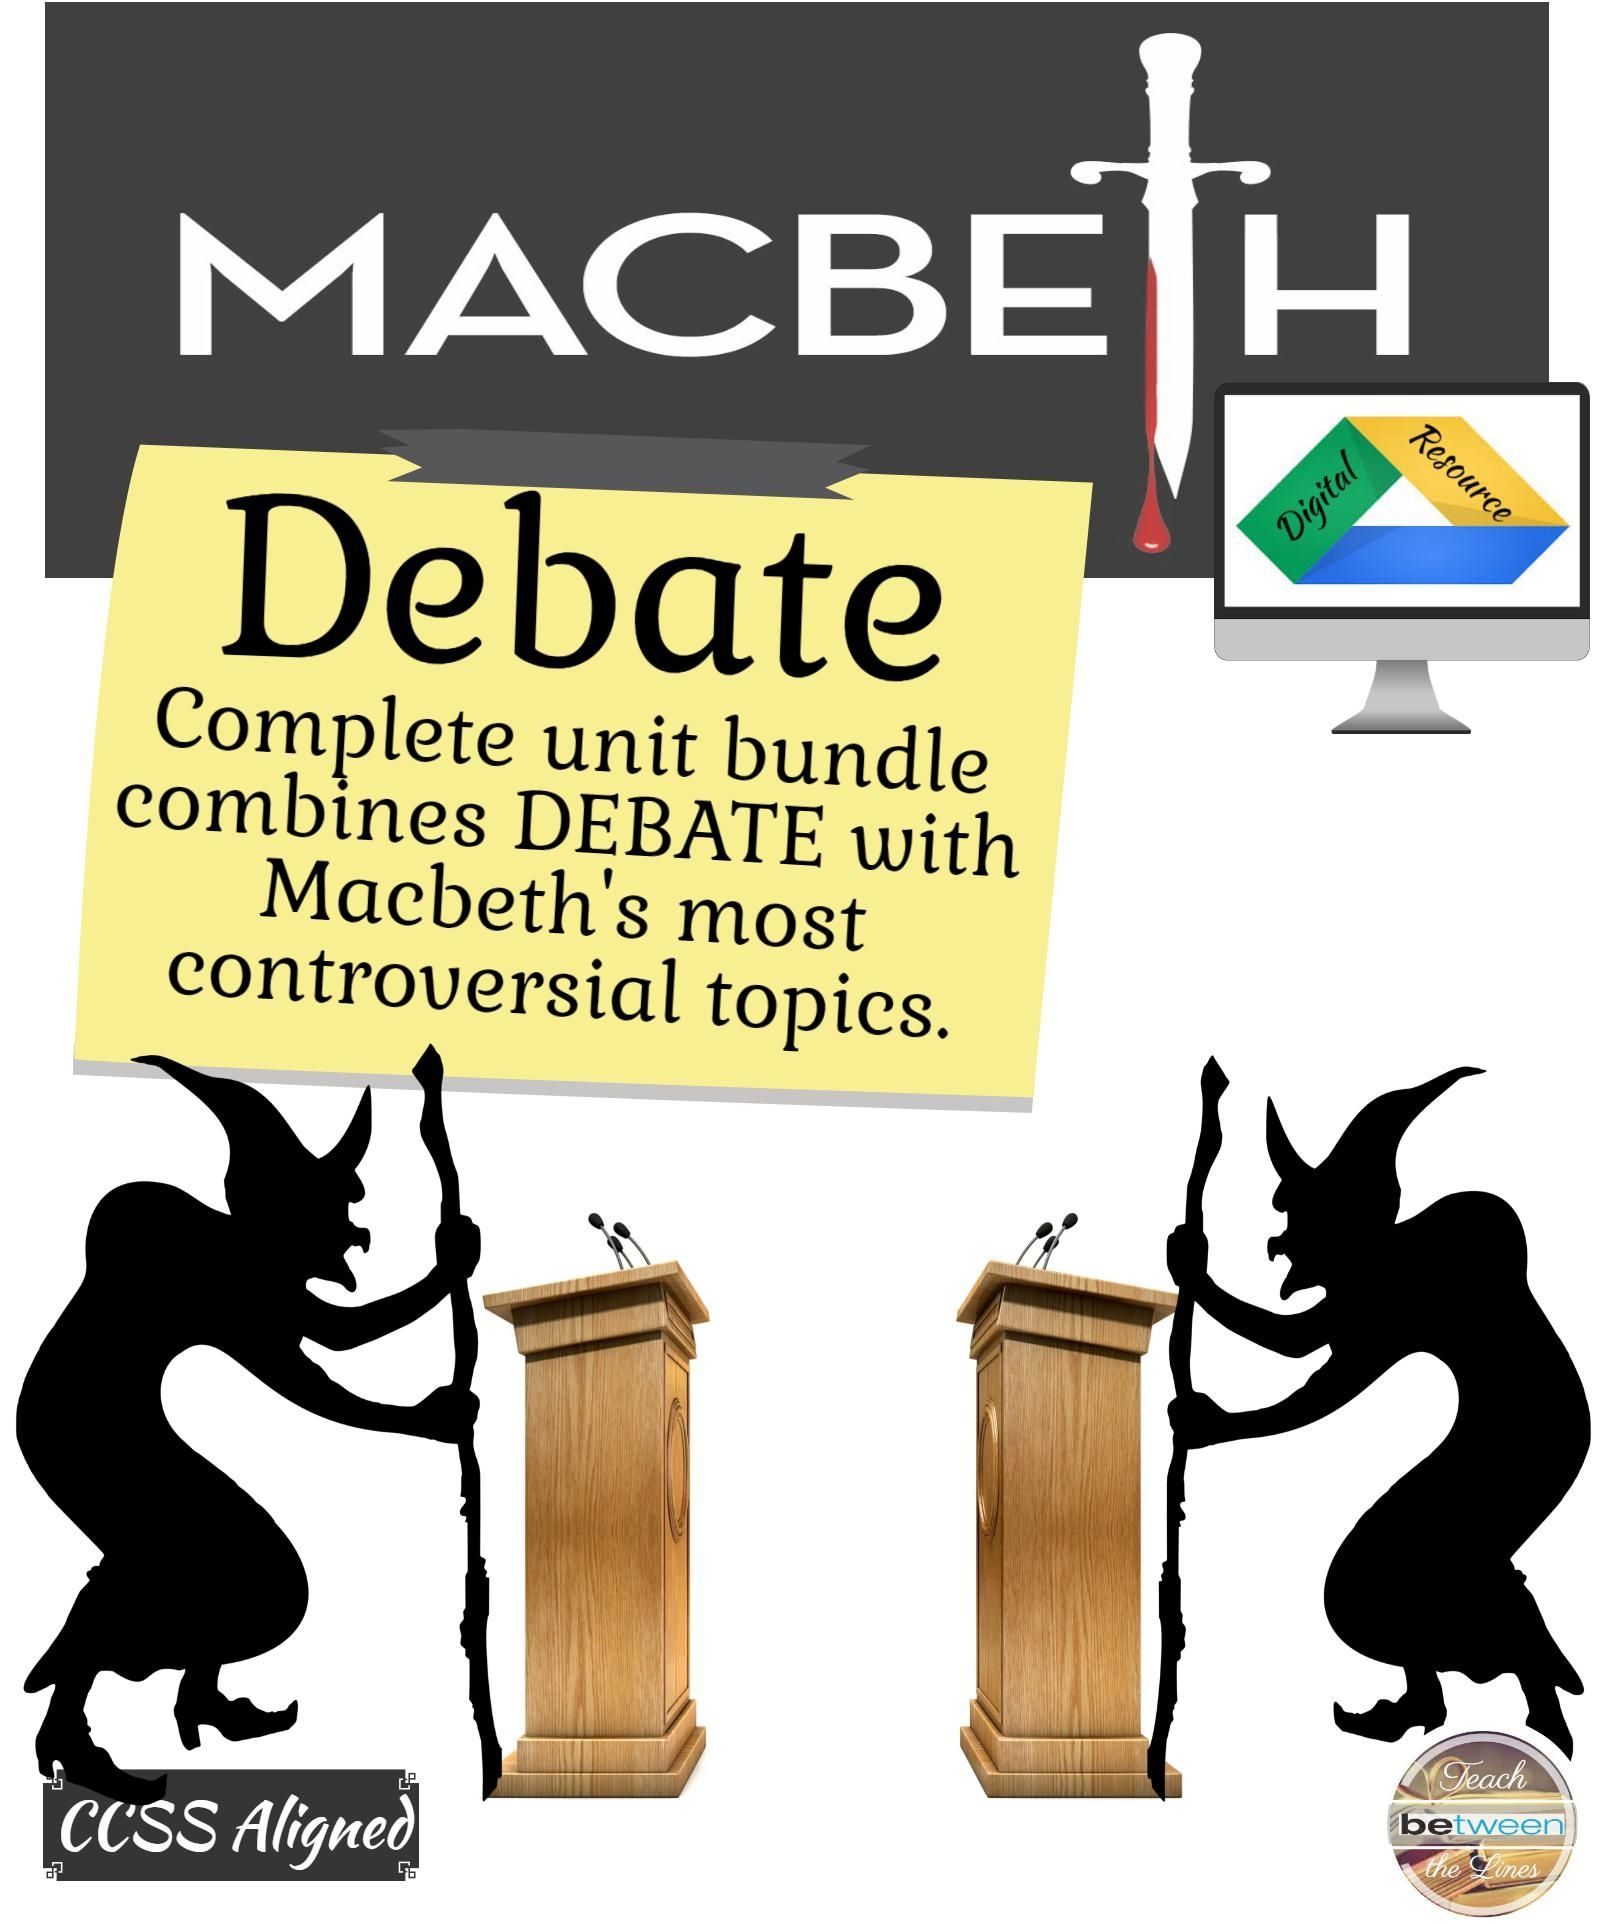 Debate With Macbeth Debating The Controversial Topics In